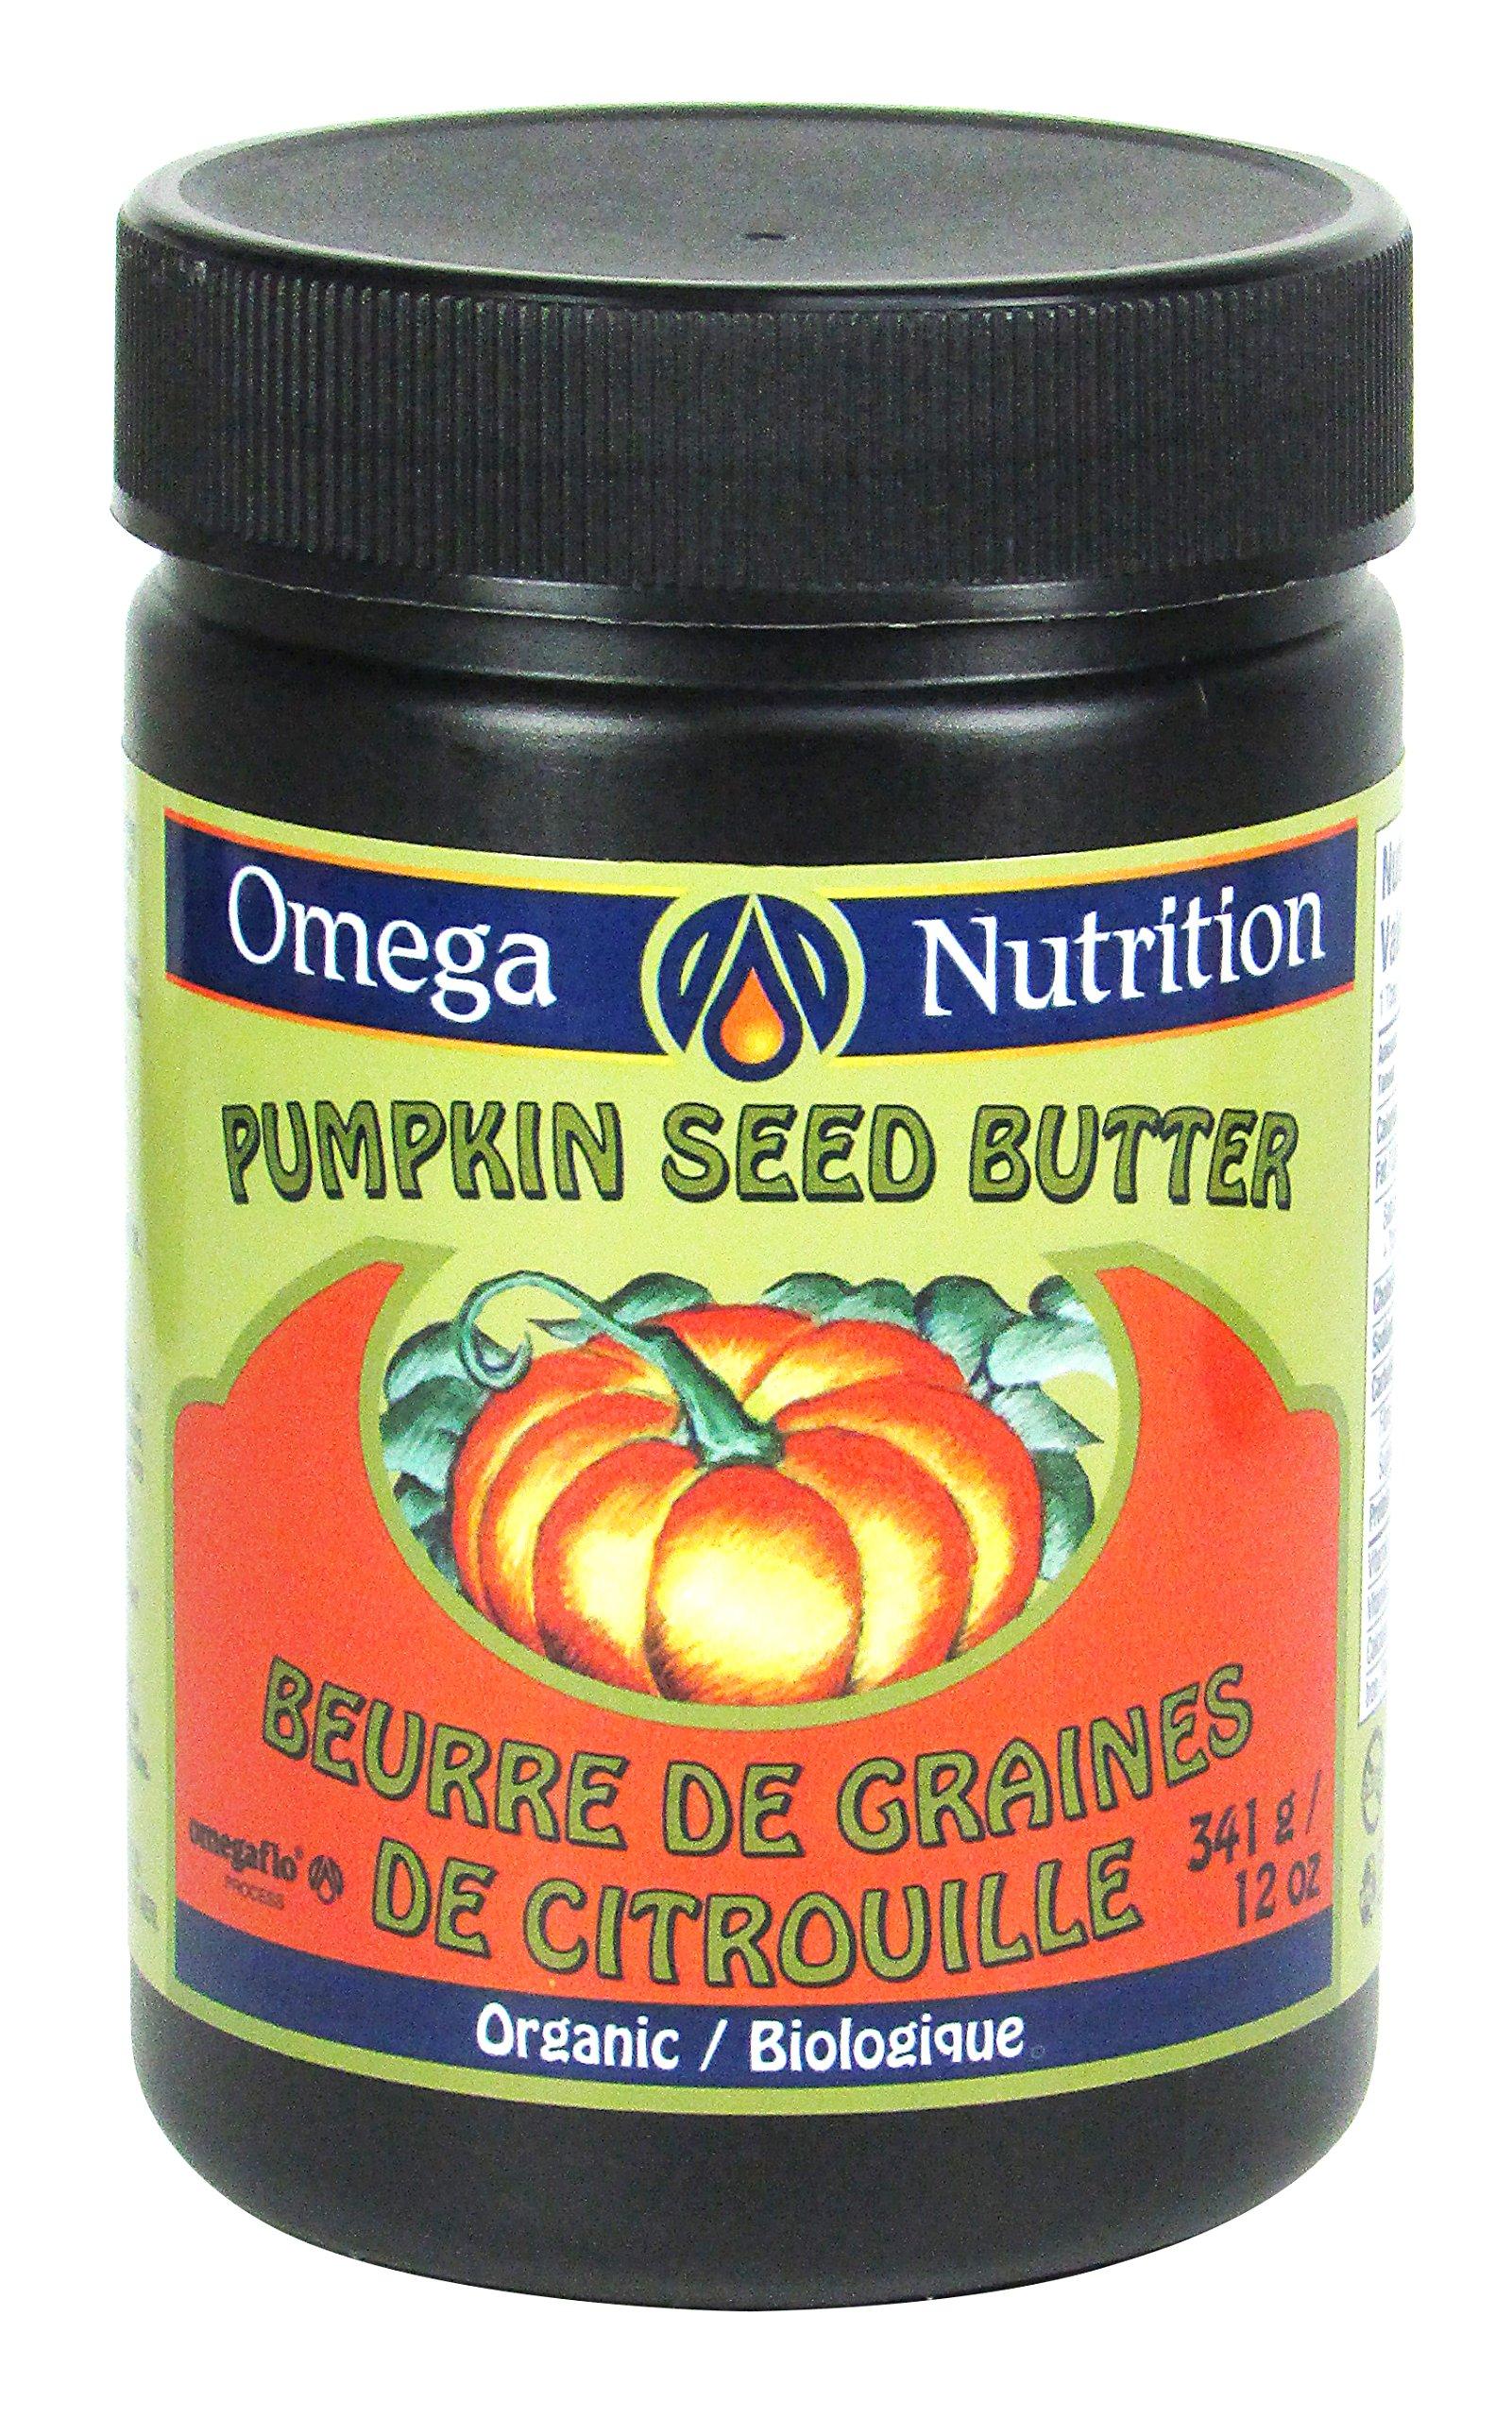 Omega Nutrition Pumpkin Seed Butter, 12-Ounce